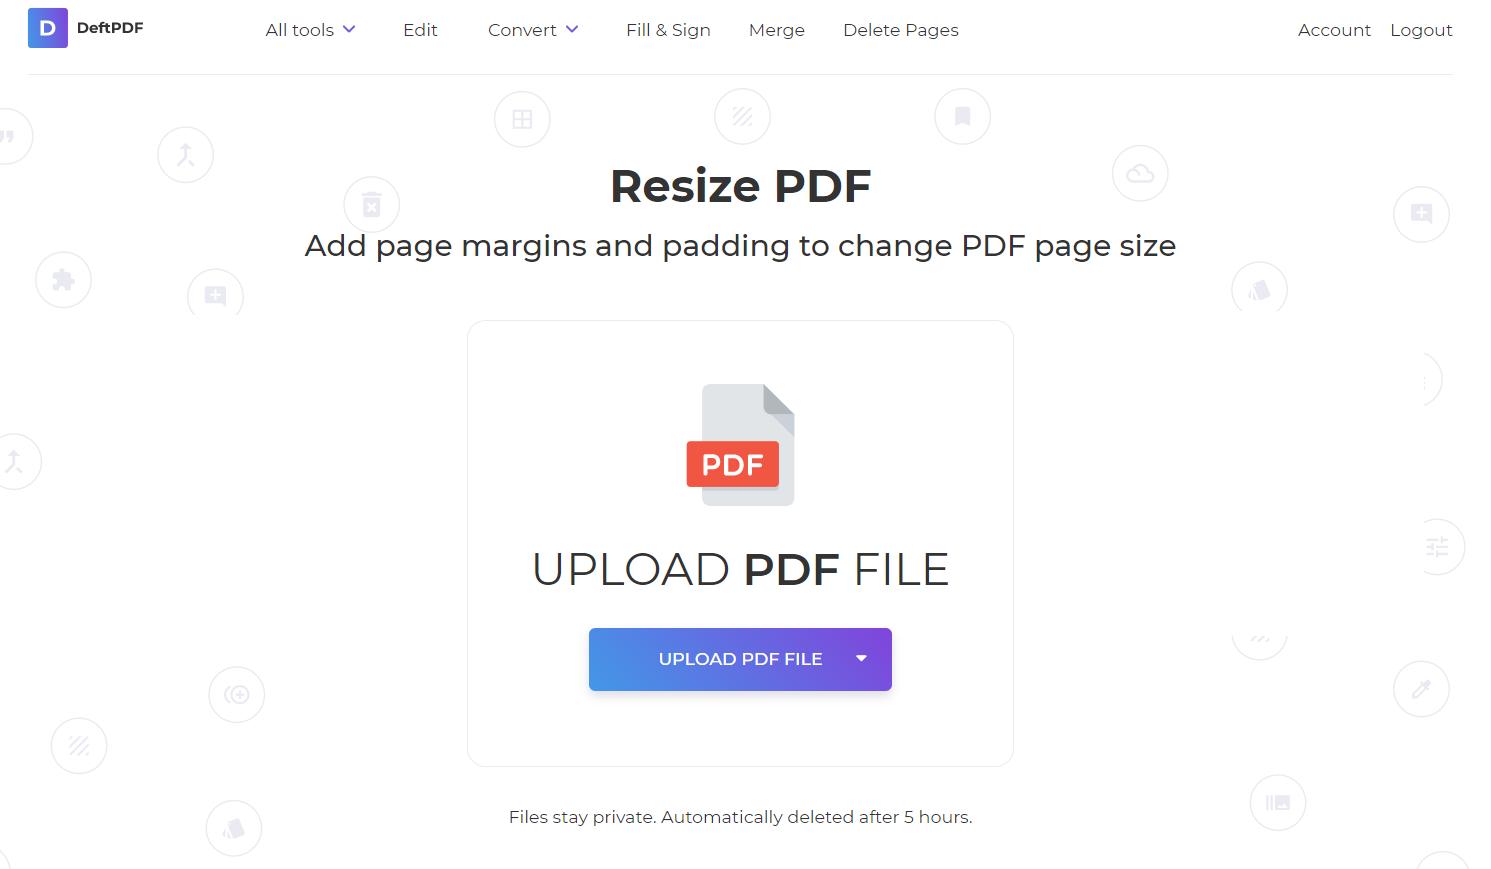 DeftPDF resize tool change paper